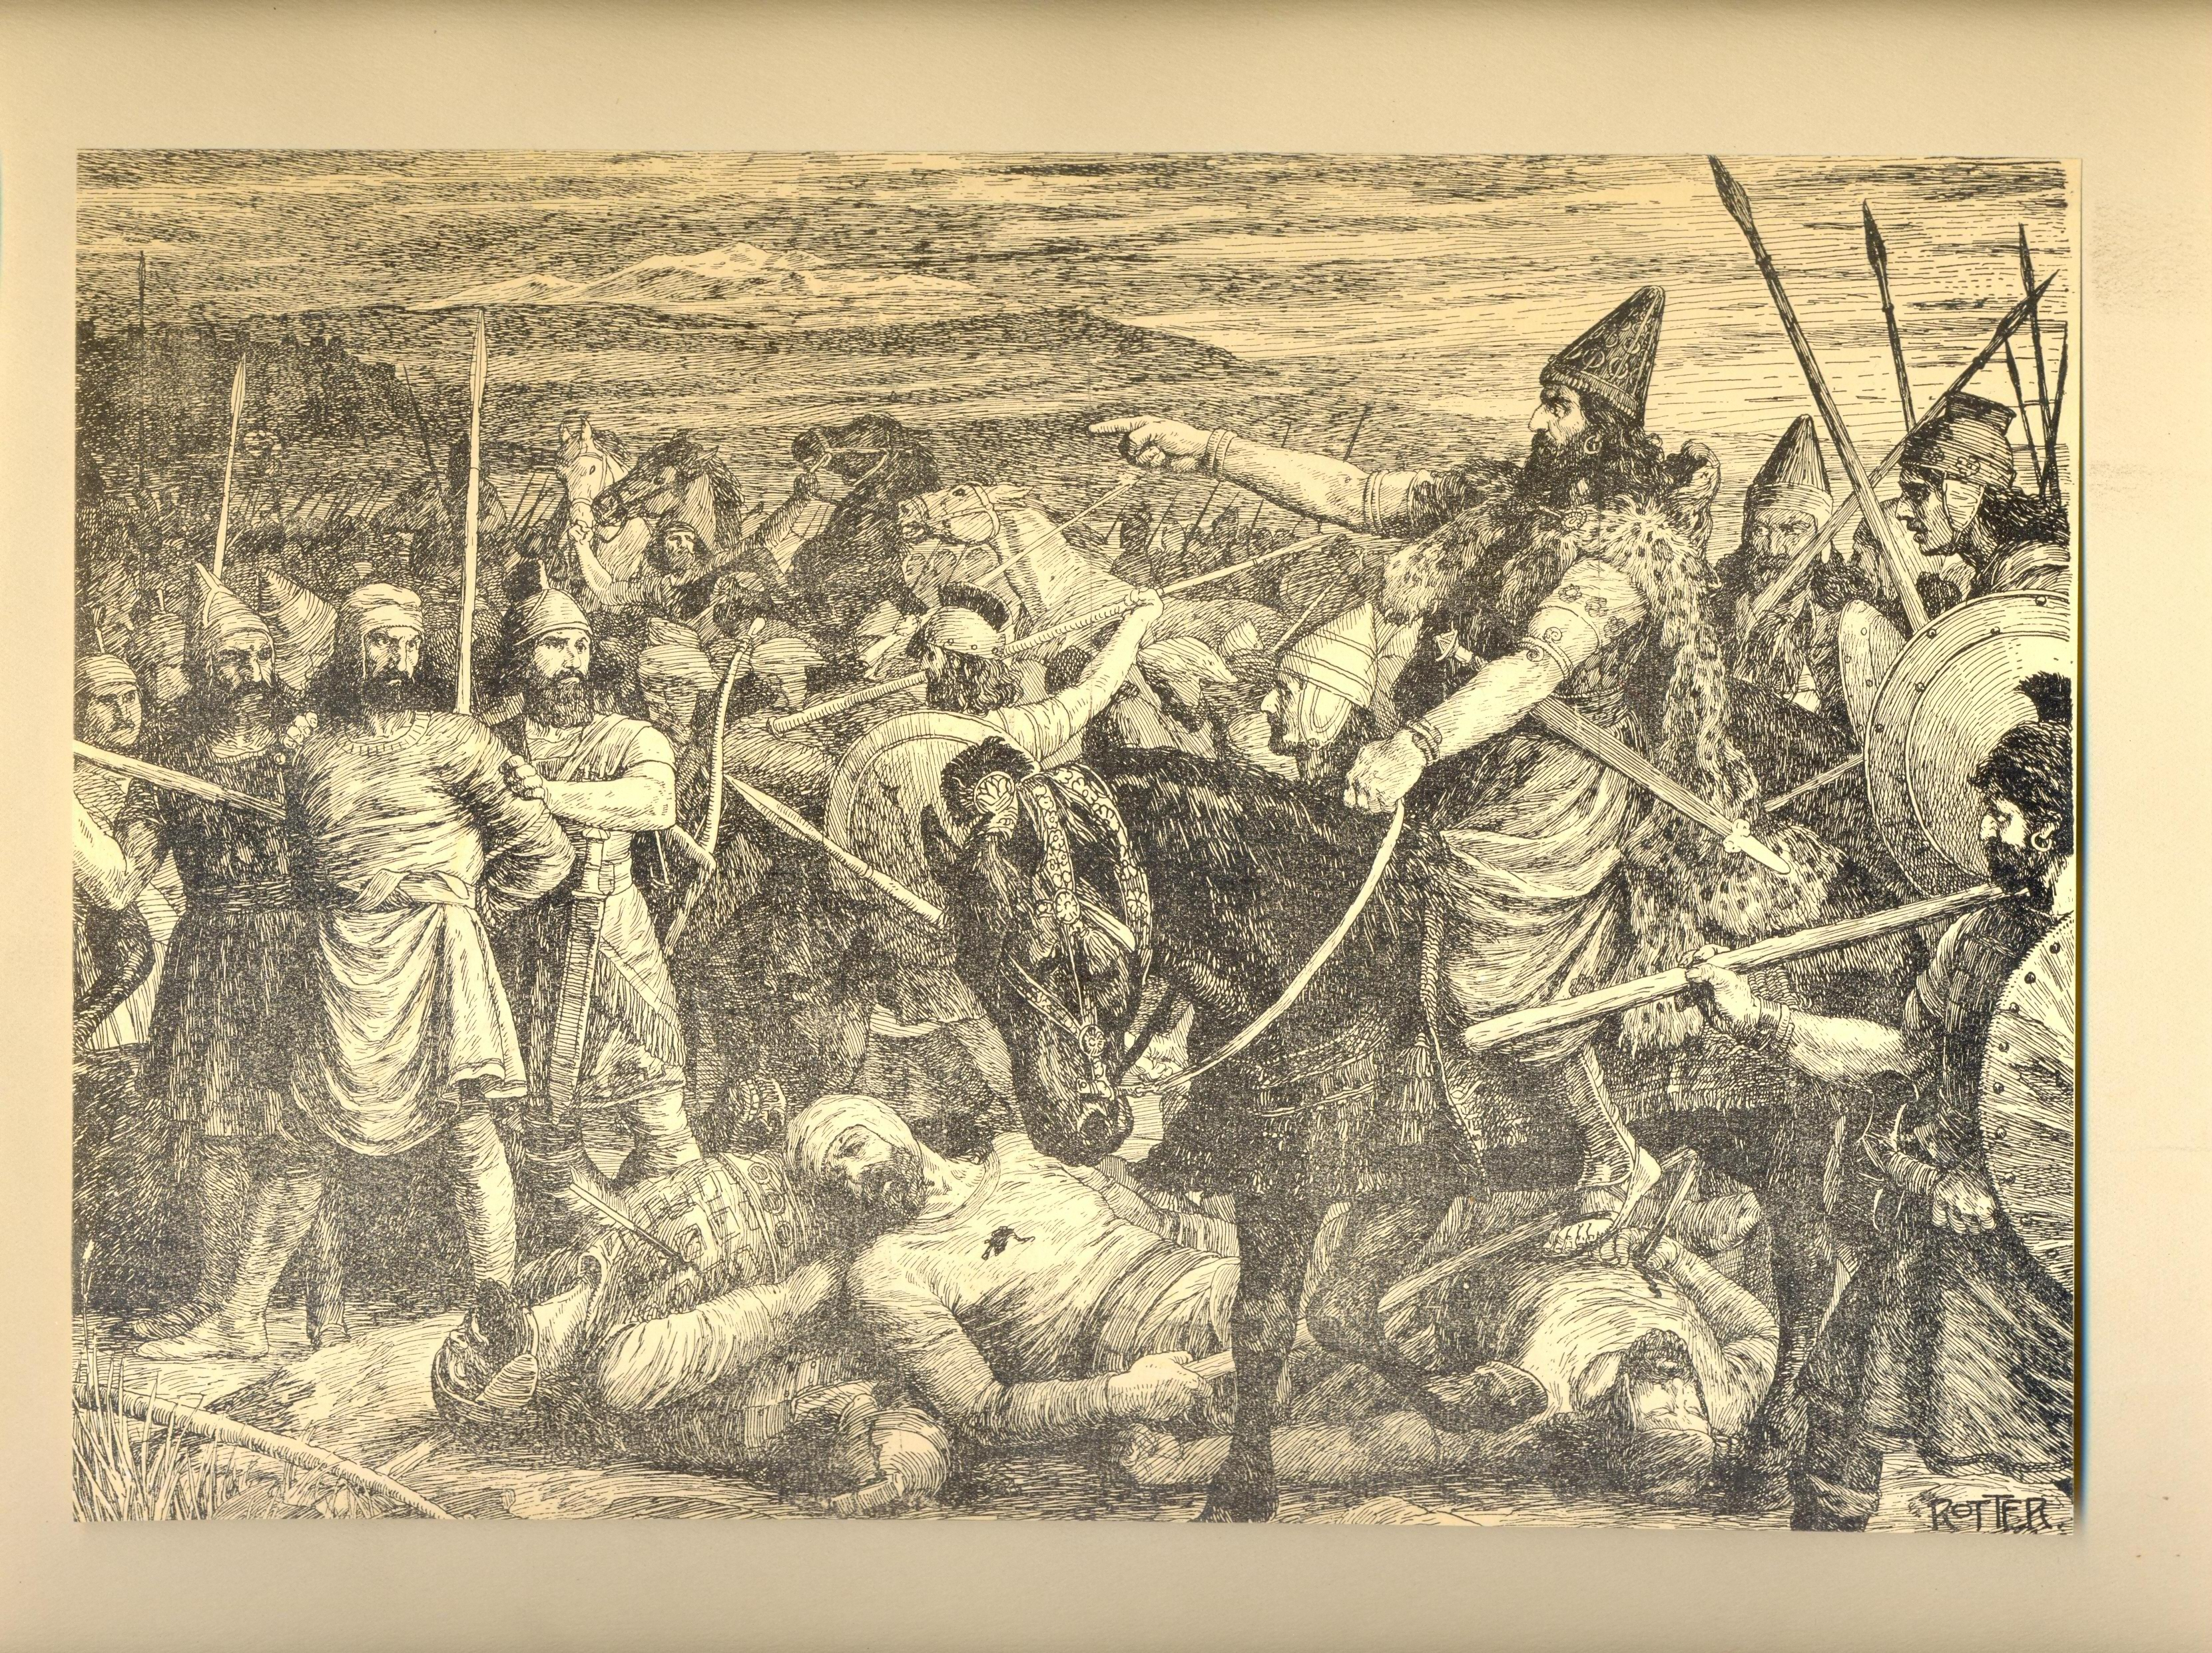 История Армении_Роттер_2_Арам и Нюкар Мадес